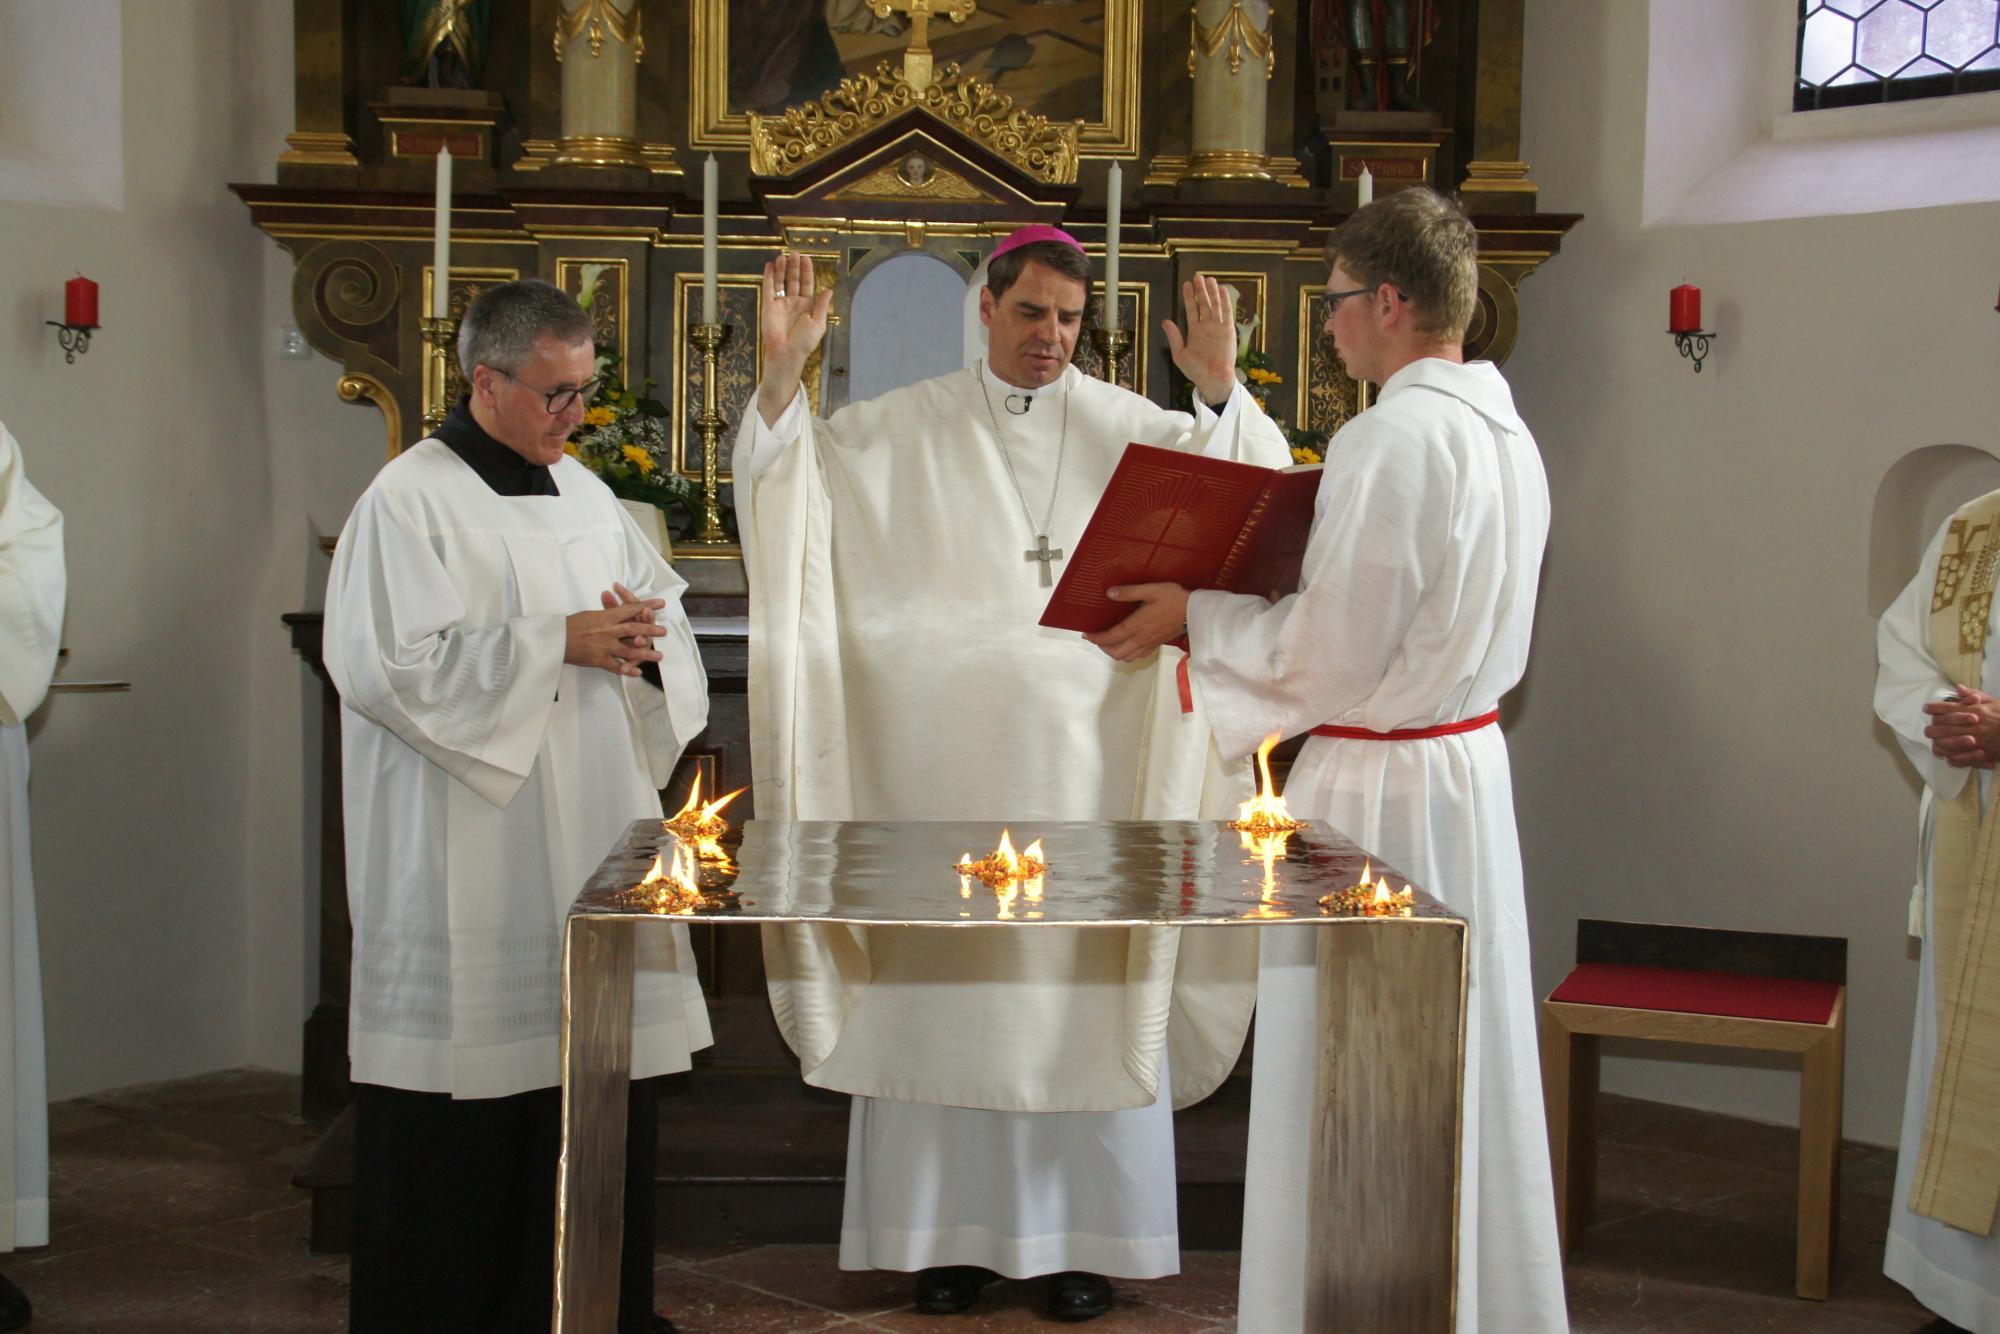 Altarweihe-Lengsham-DSC06309